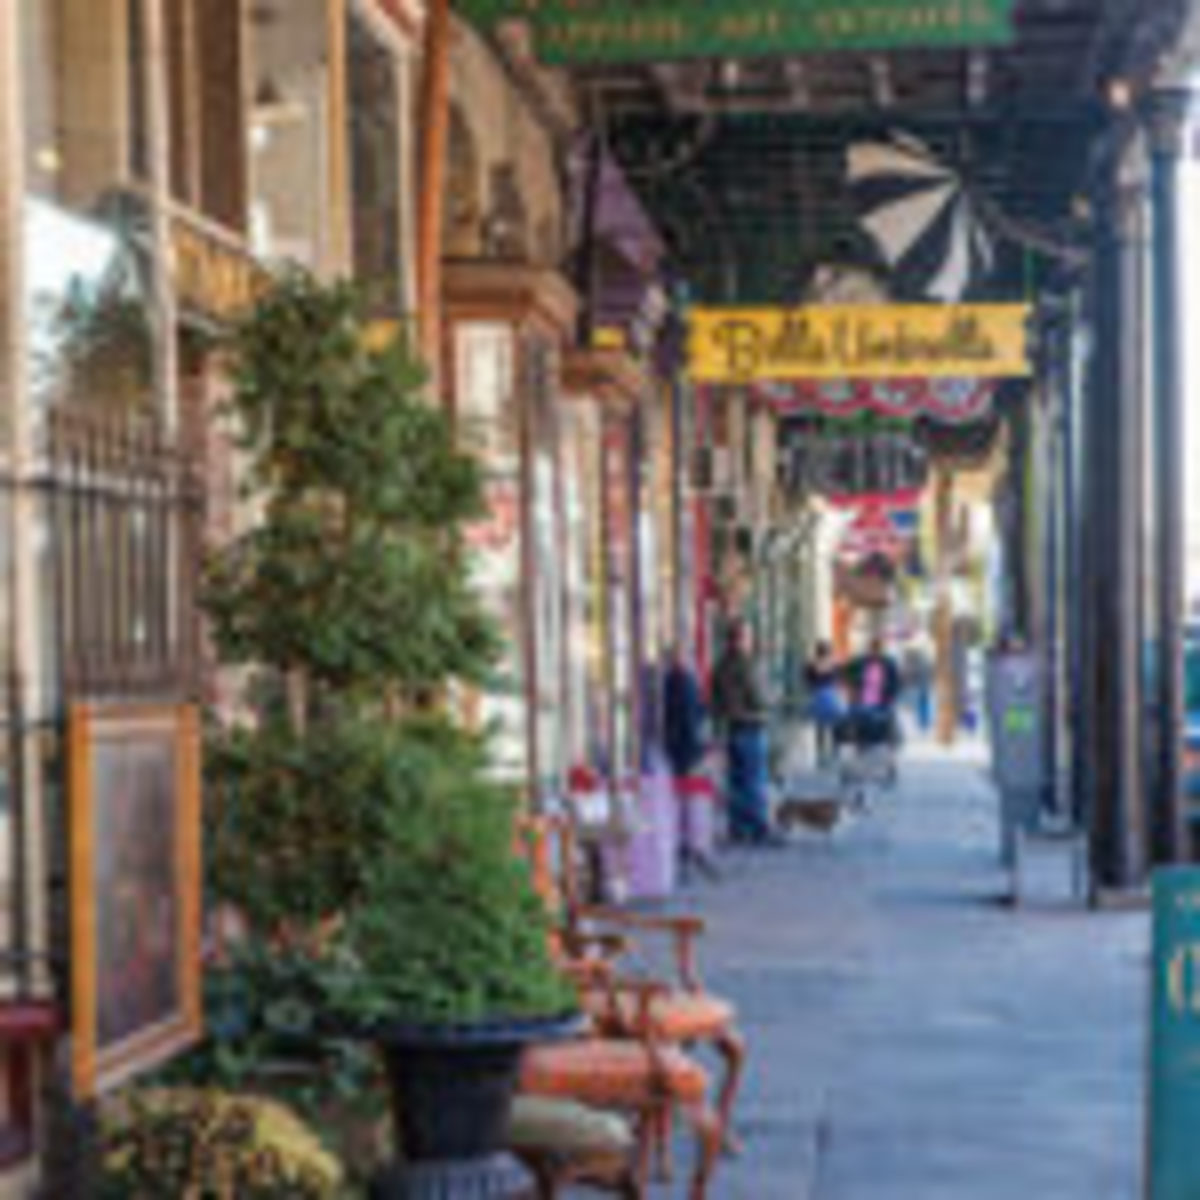 Magazine Street by Richard Nowitz, Courtesy New Orleans & Company, www.neworleans.com